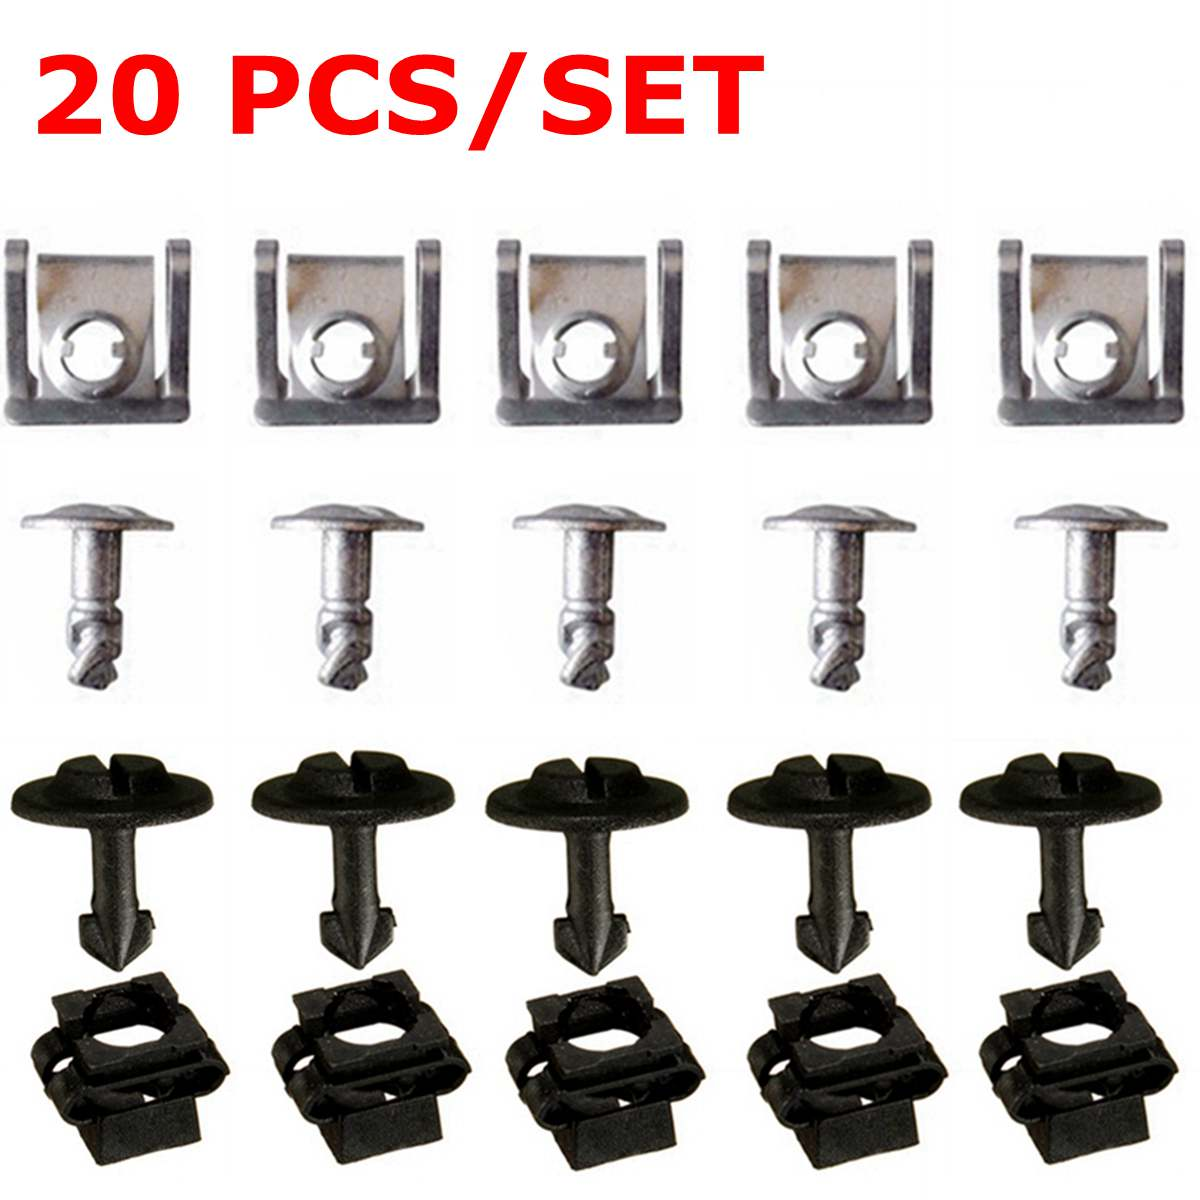 20 pçs/set Sob Parafusos Da Tampa Do Motor & Clipes Set para VW Passat para B5 para Modelos Audi A4 A6 8D0805960 8D0805121